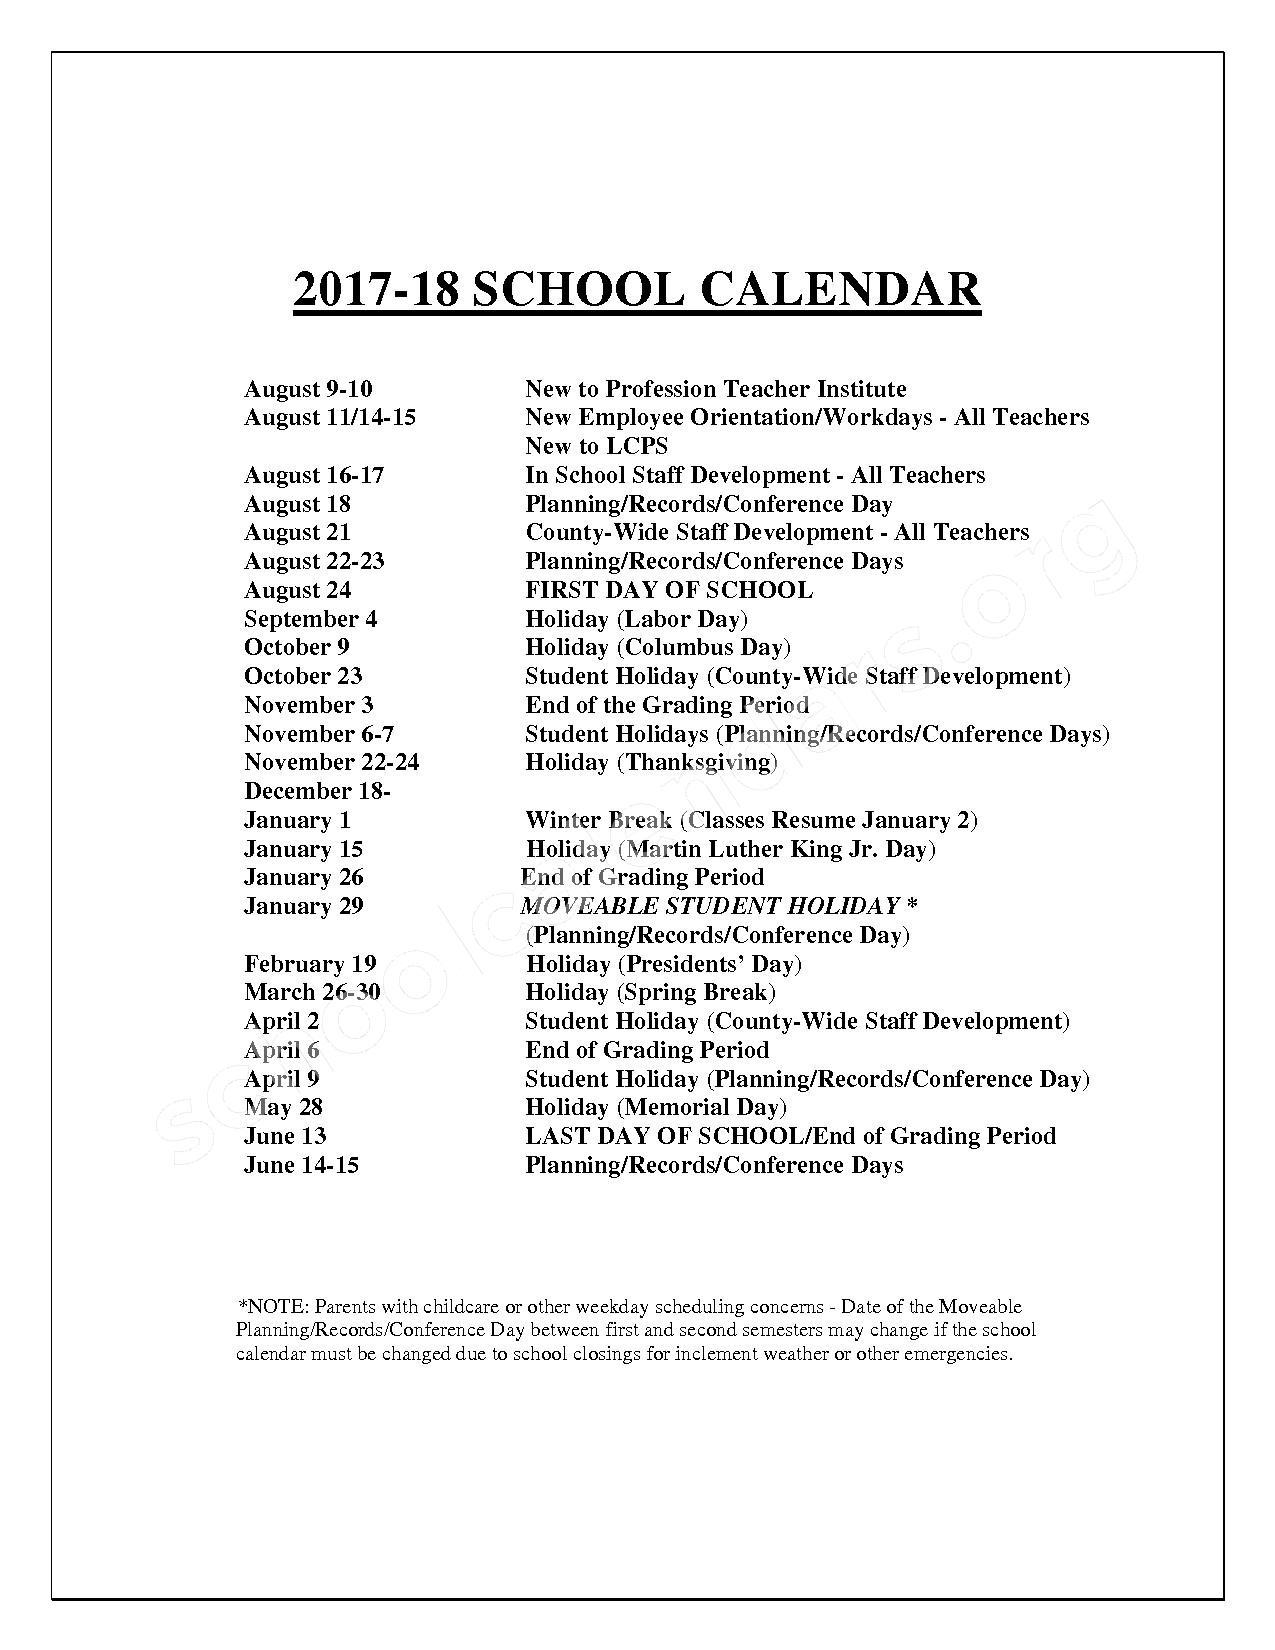 2017 - 2018 Teacher & Staff Calendar – Loudoun County Public Schools – page 2